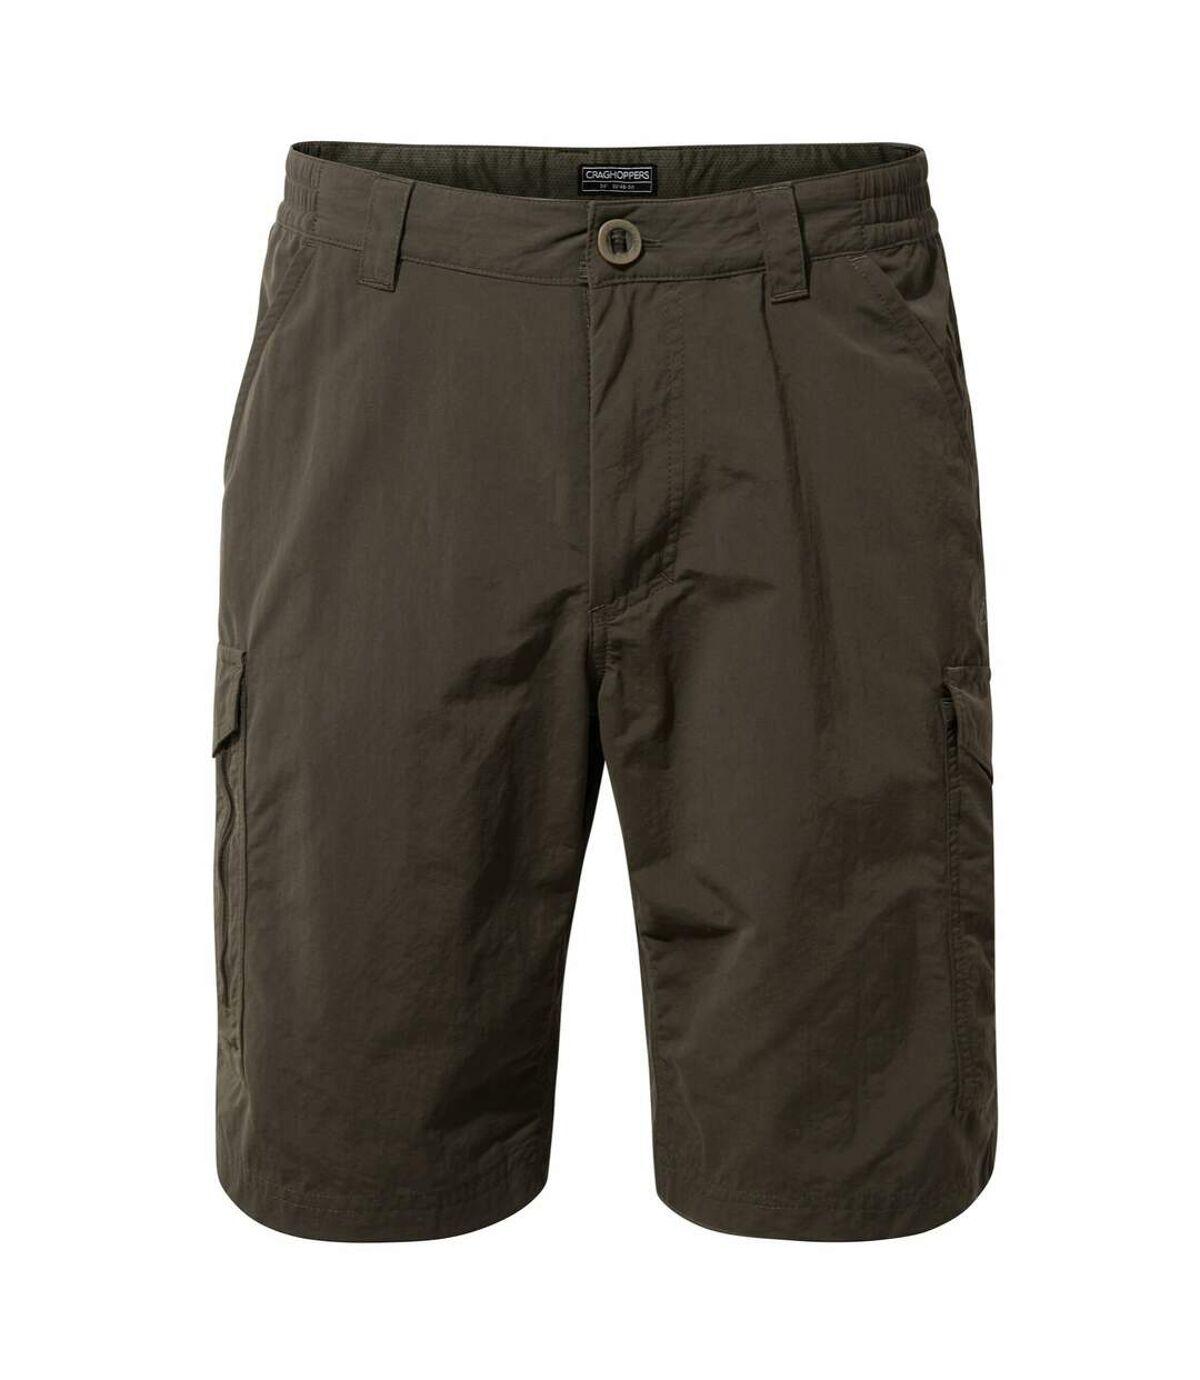 Craghoppers Mens NosiLife Cargo II Shorts (Woodland Green) - UTCG1117